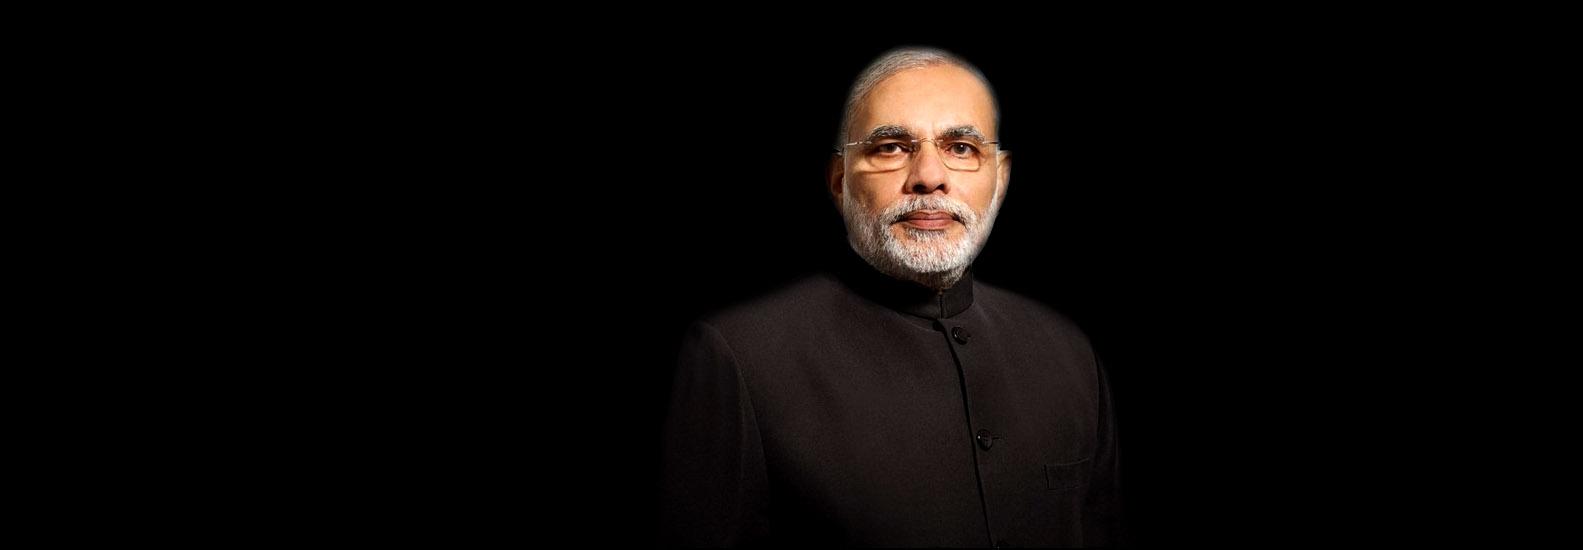 Modi Banner